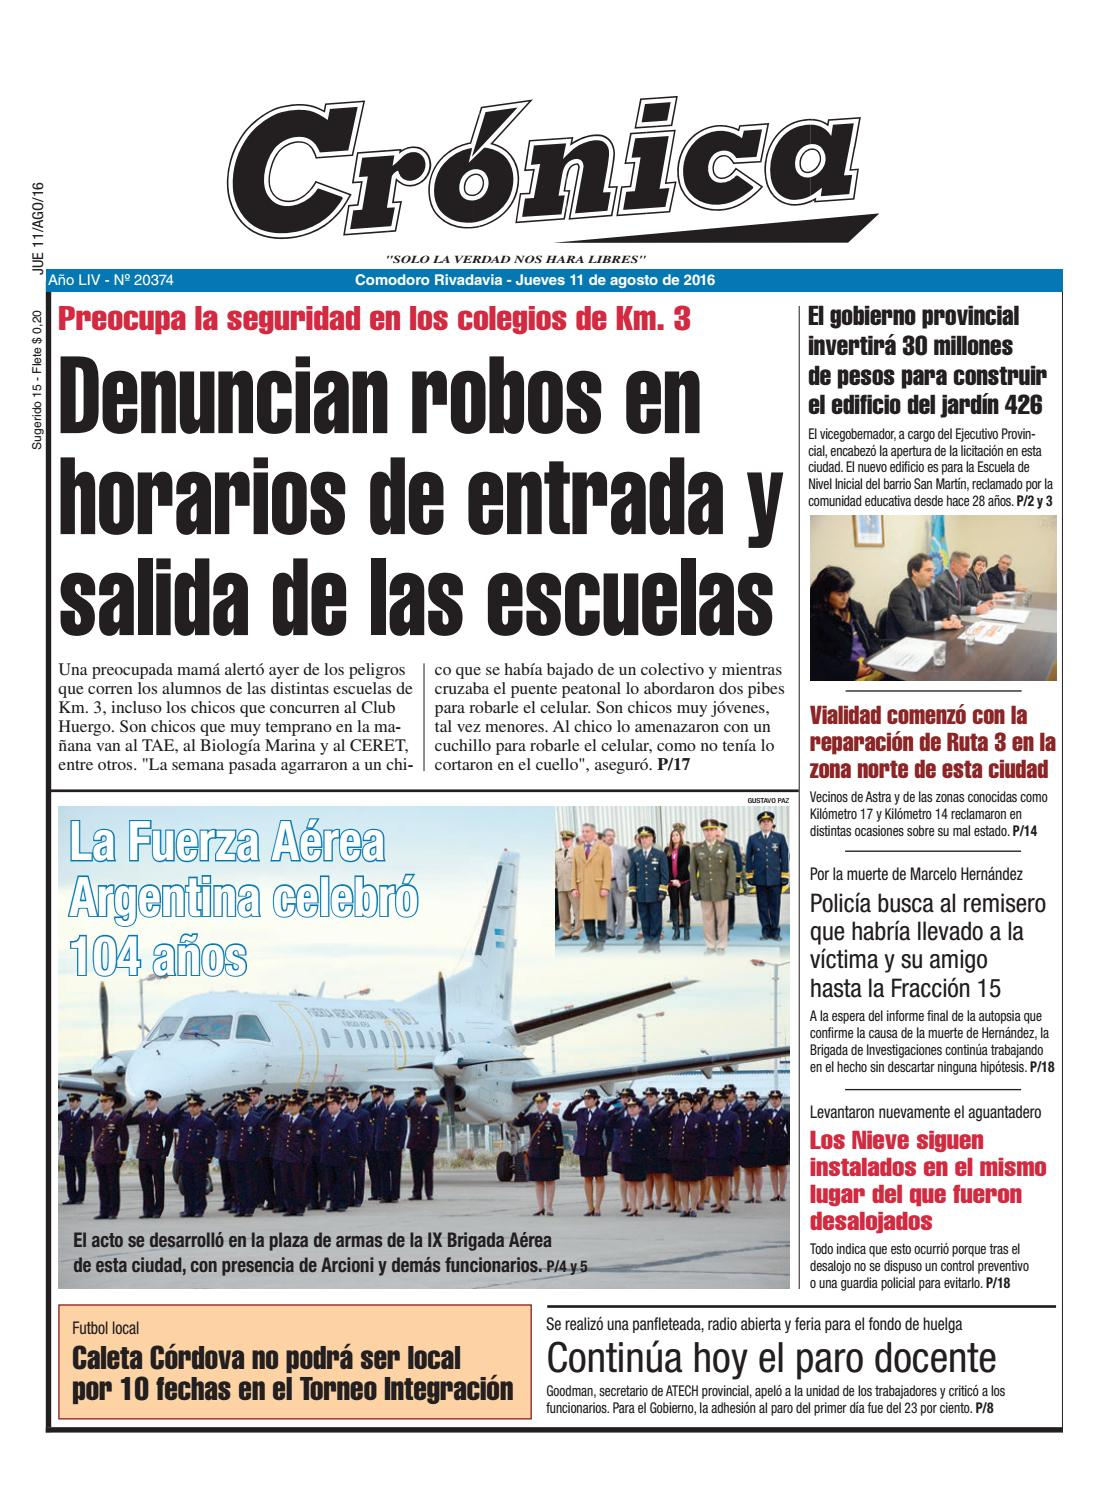 7e18b659e C73c2f29163730c01d04175f97ea9abe by Diario Crónica - issuu